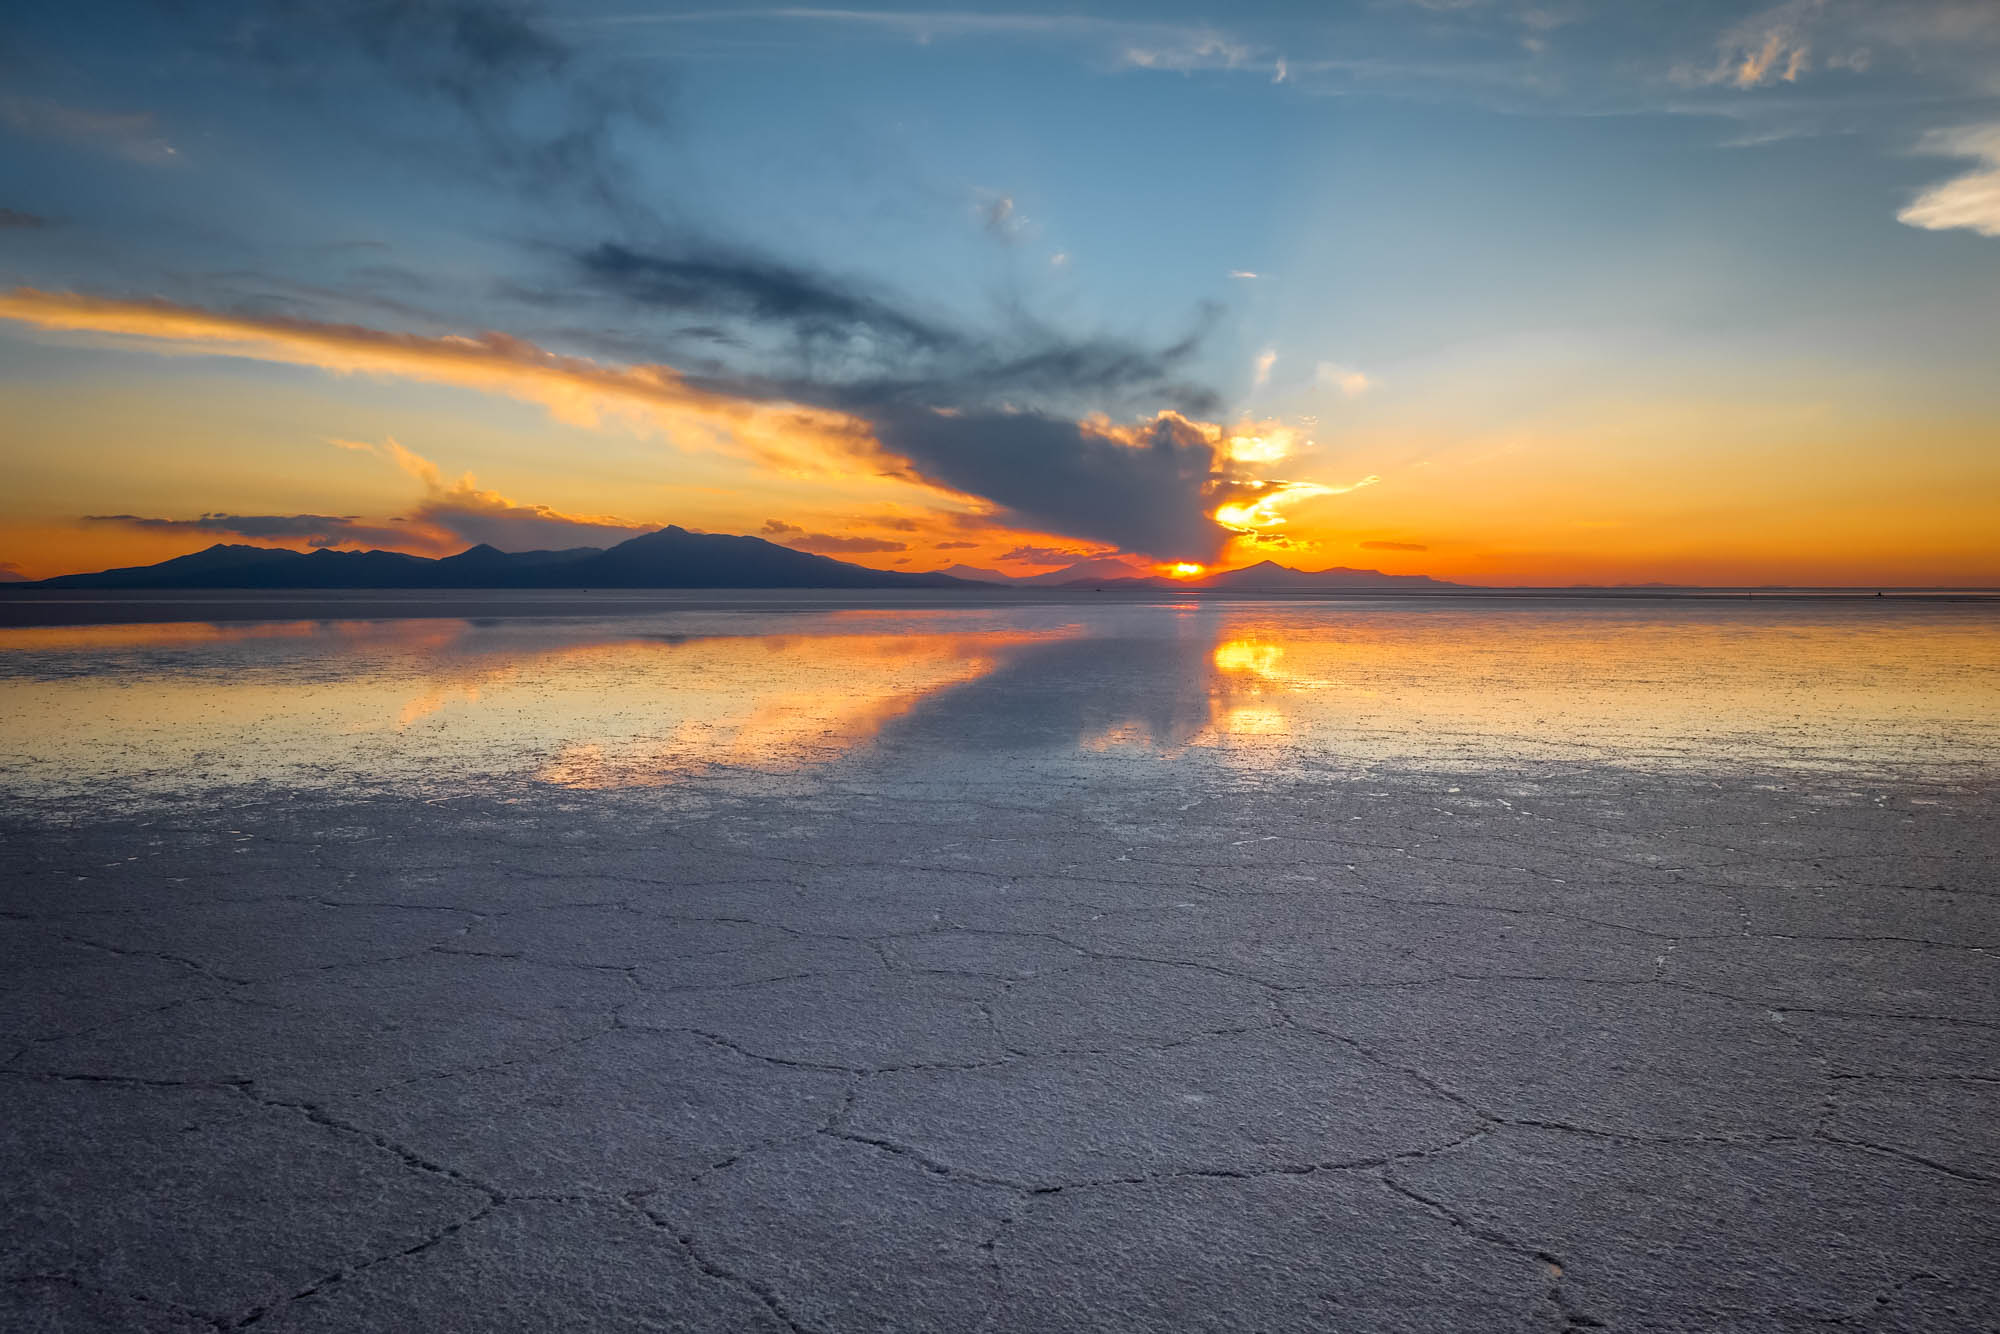 Sunset in Salar de Uyuni salt flats desert, Andes Altiplano, Bolivia